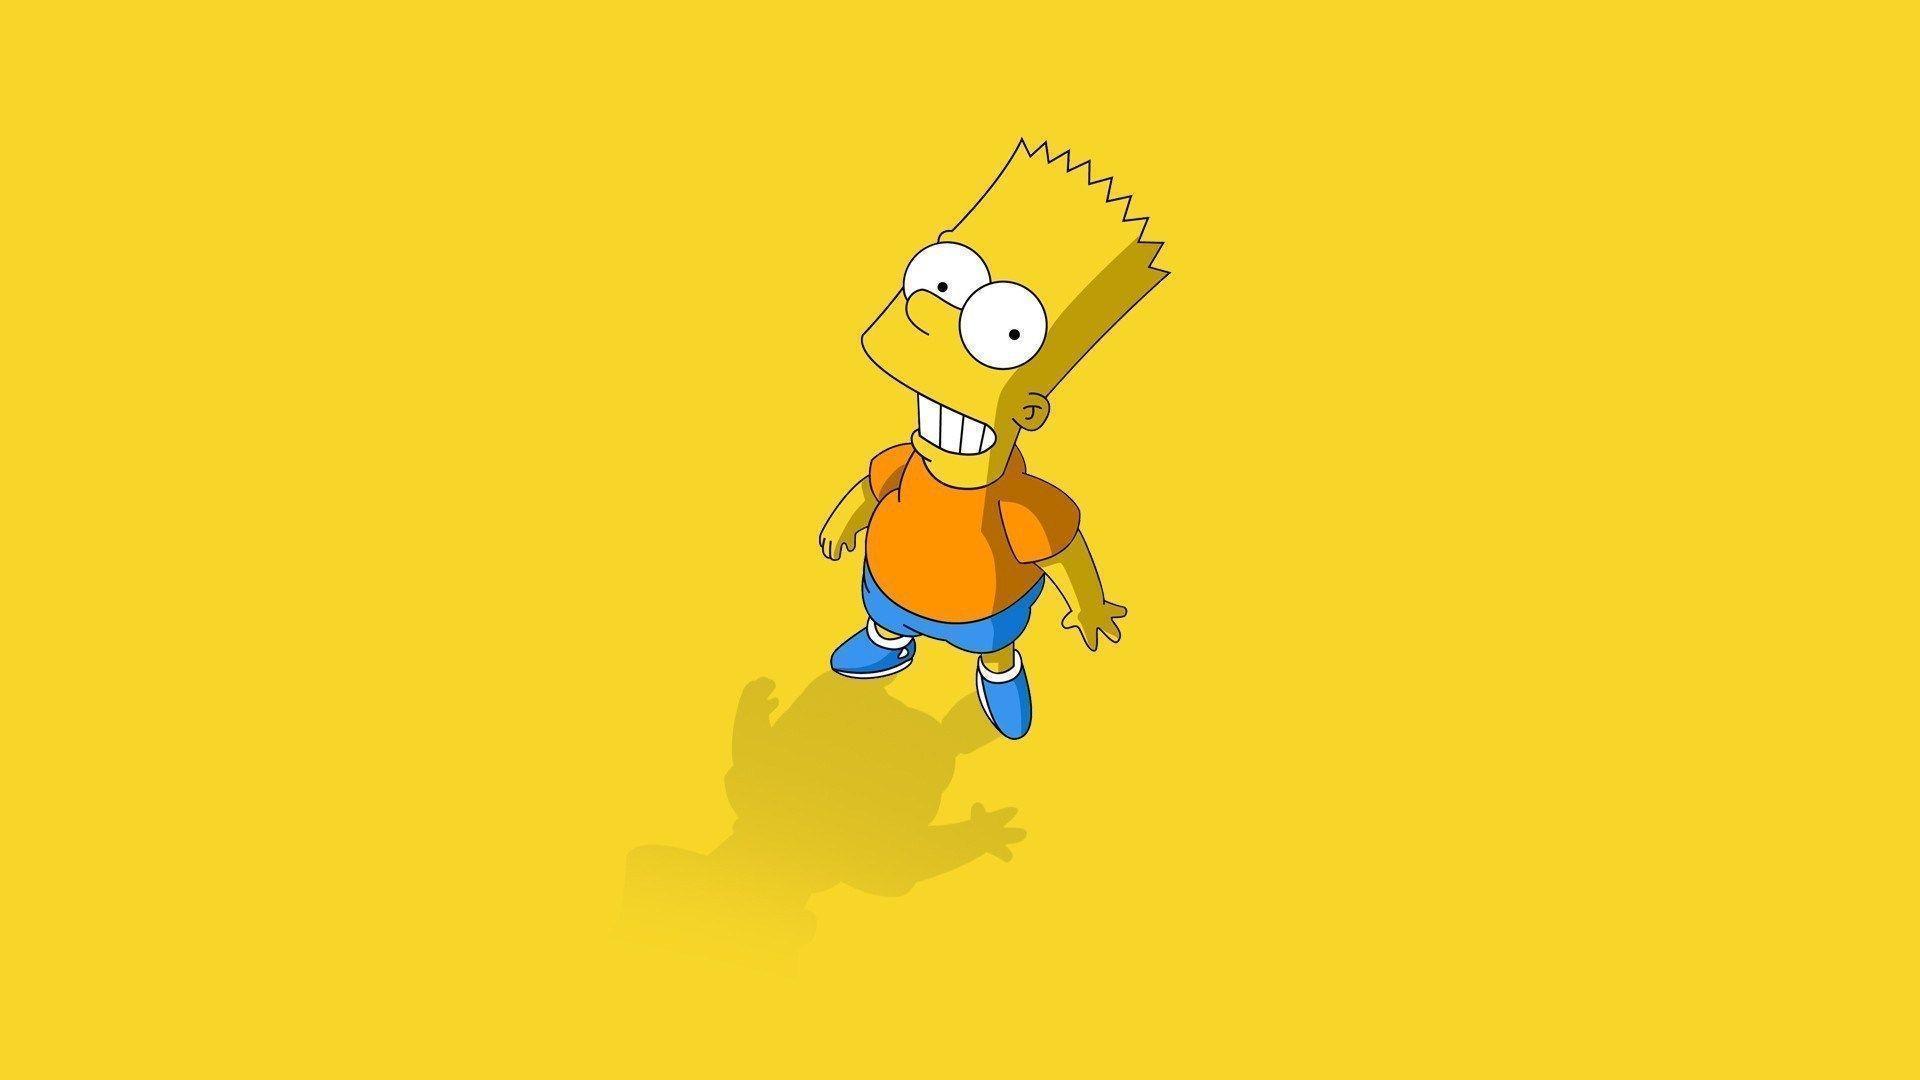 The Simpsons Wallpaper Bart - wallpaper.